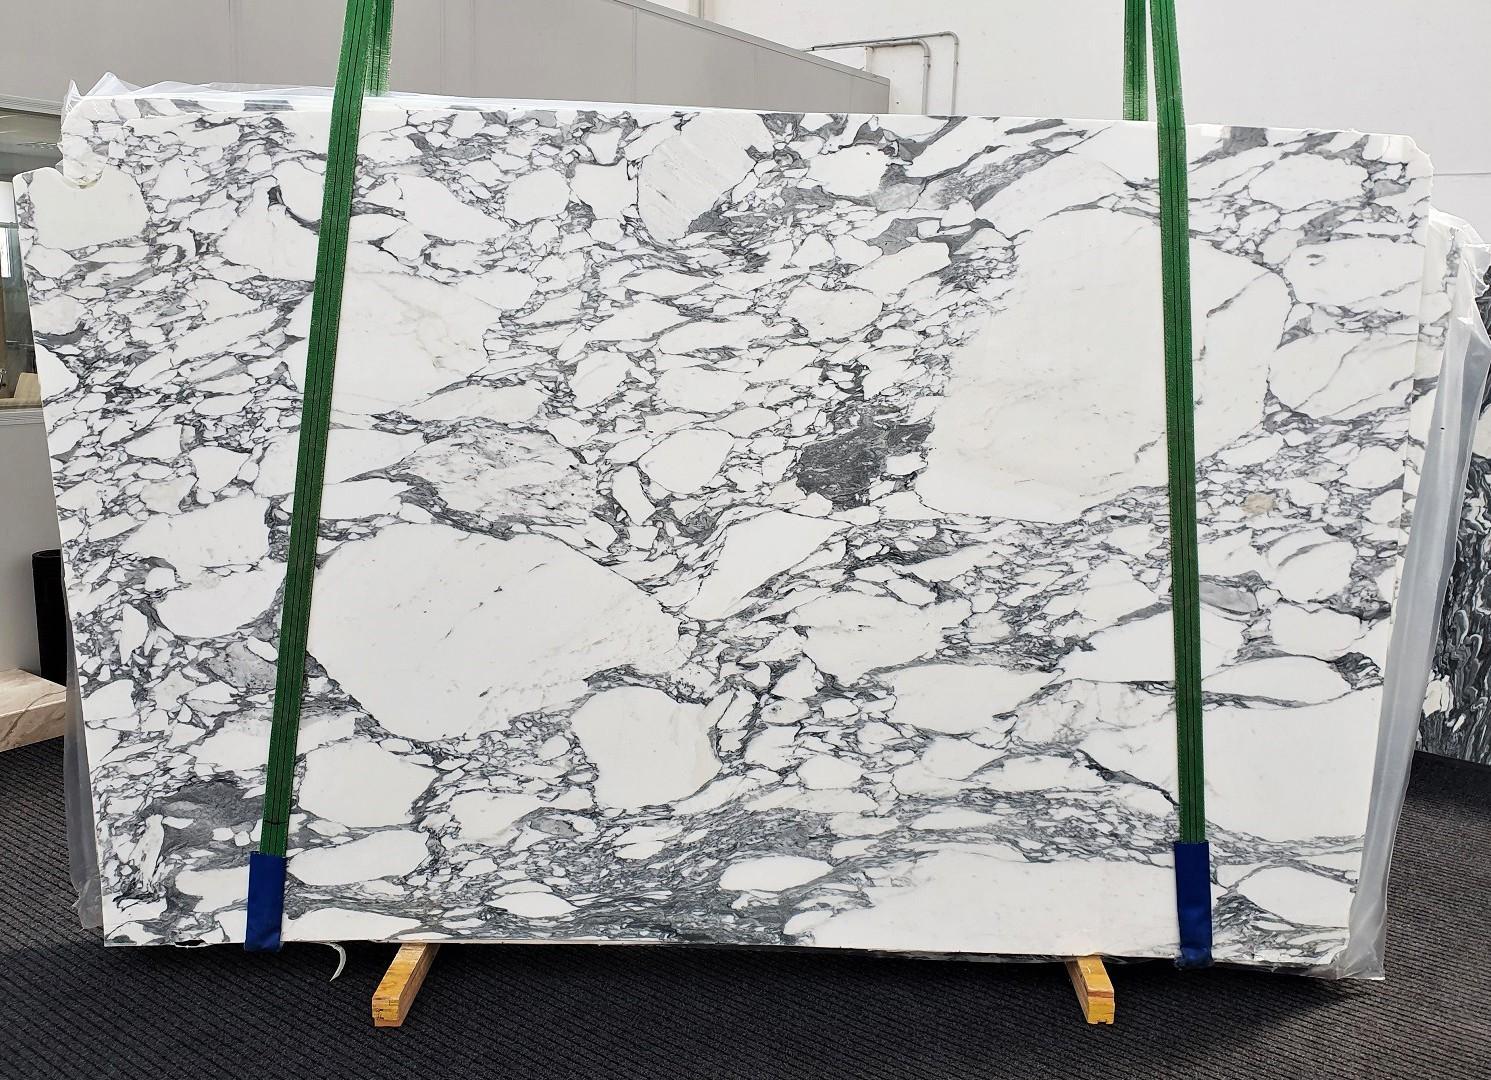 ARABESCATO CORCHIA Supply Veneto (Italy) polished slabs 1433 , Slab #55 natural marble